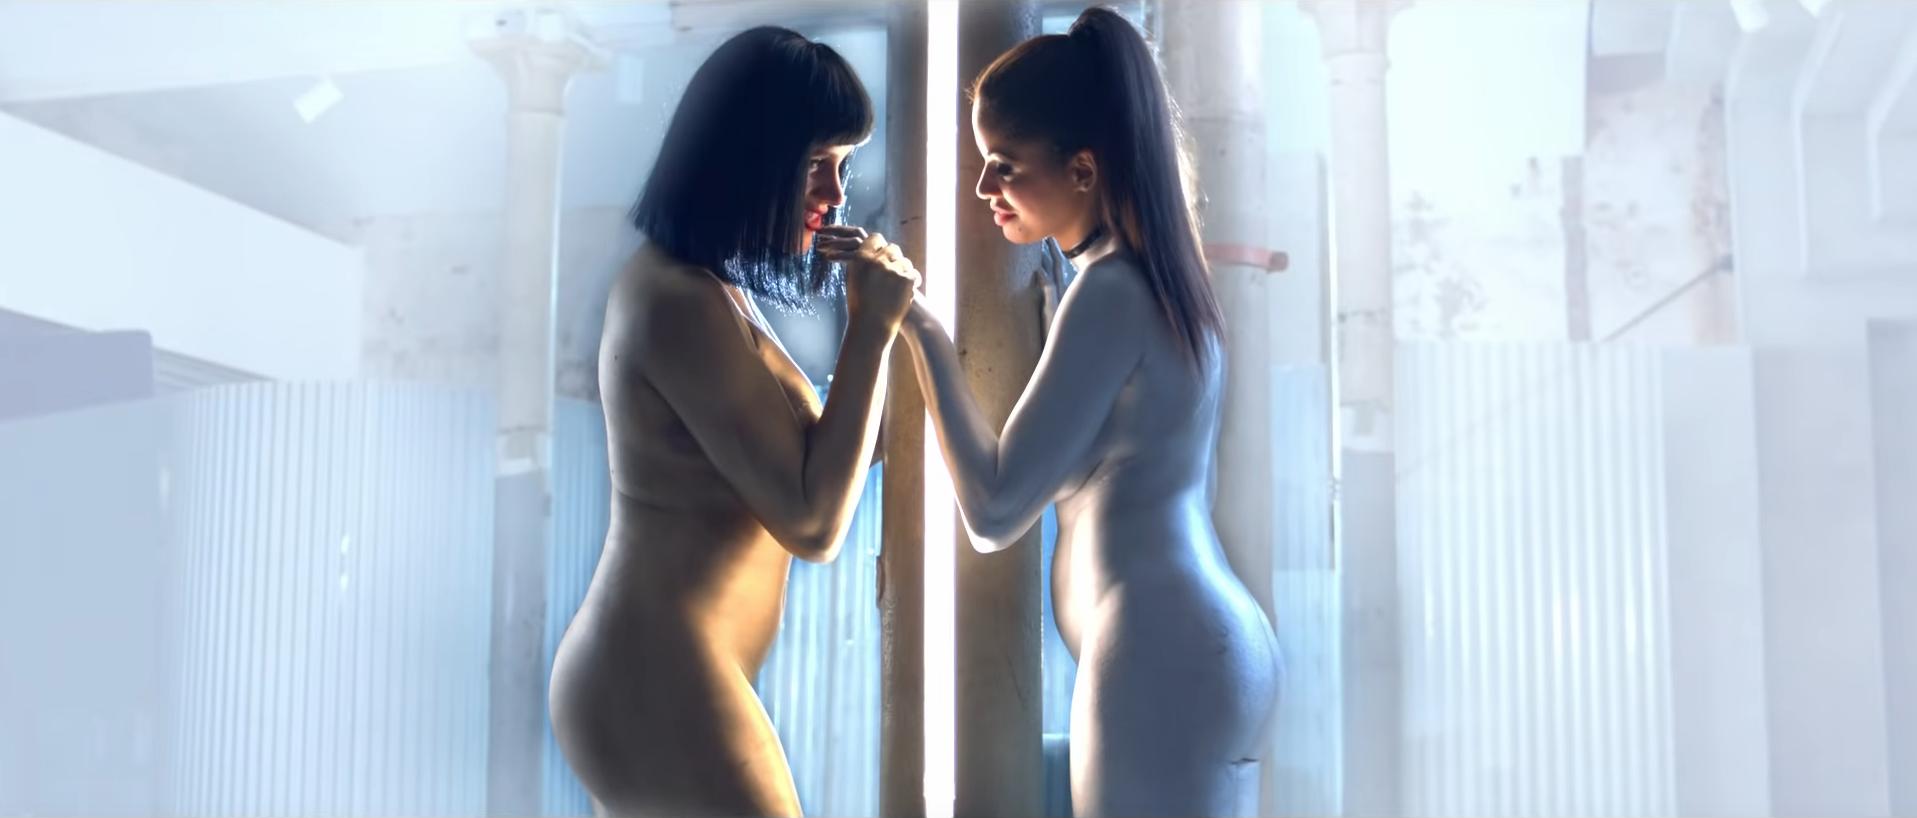 El Videoclip Lésbico De Jennifer Rojo